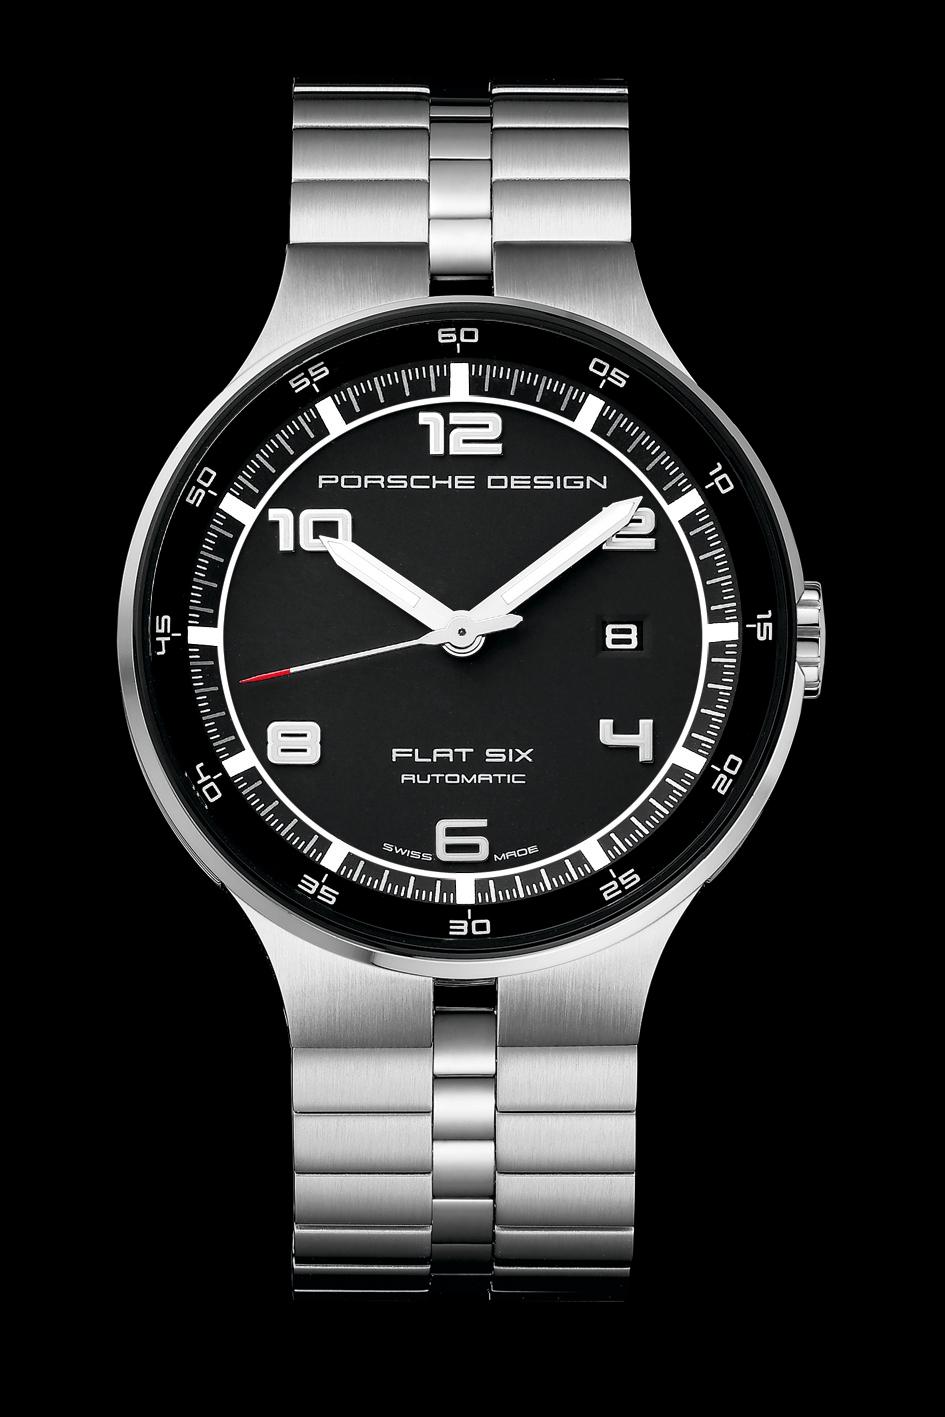 Porsche Design P'6350 Flat Six Automatic 44 timepiece. Iconic style. A puristic timepiece, uniquely interpreted.